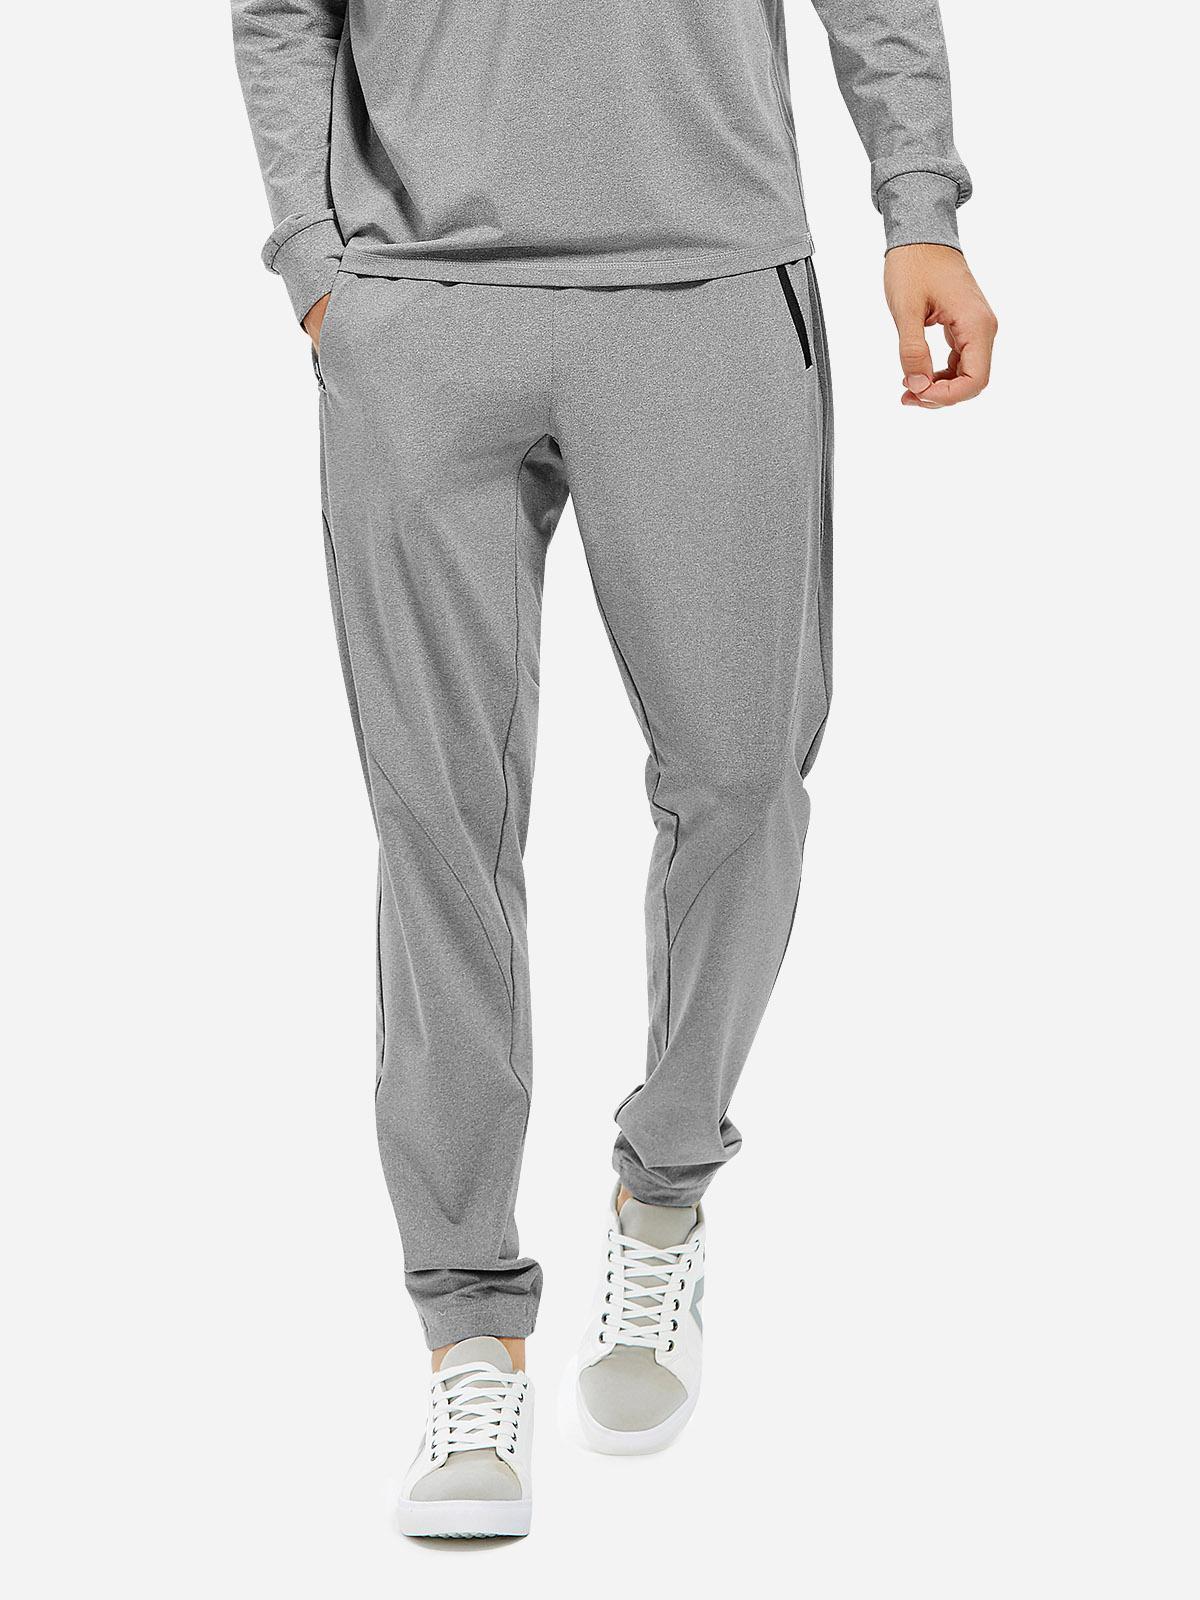 ZAN.STYLE Men Joggers Sweatpants with Zip Pocket